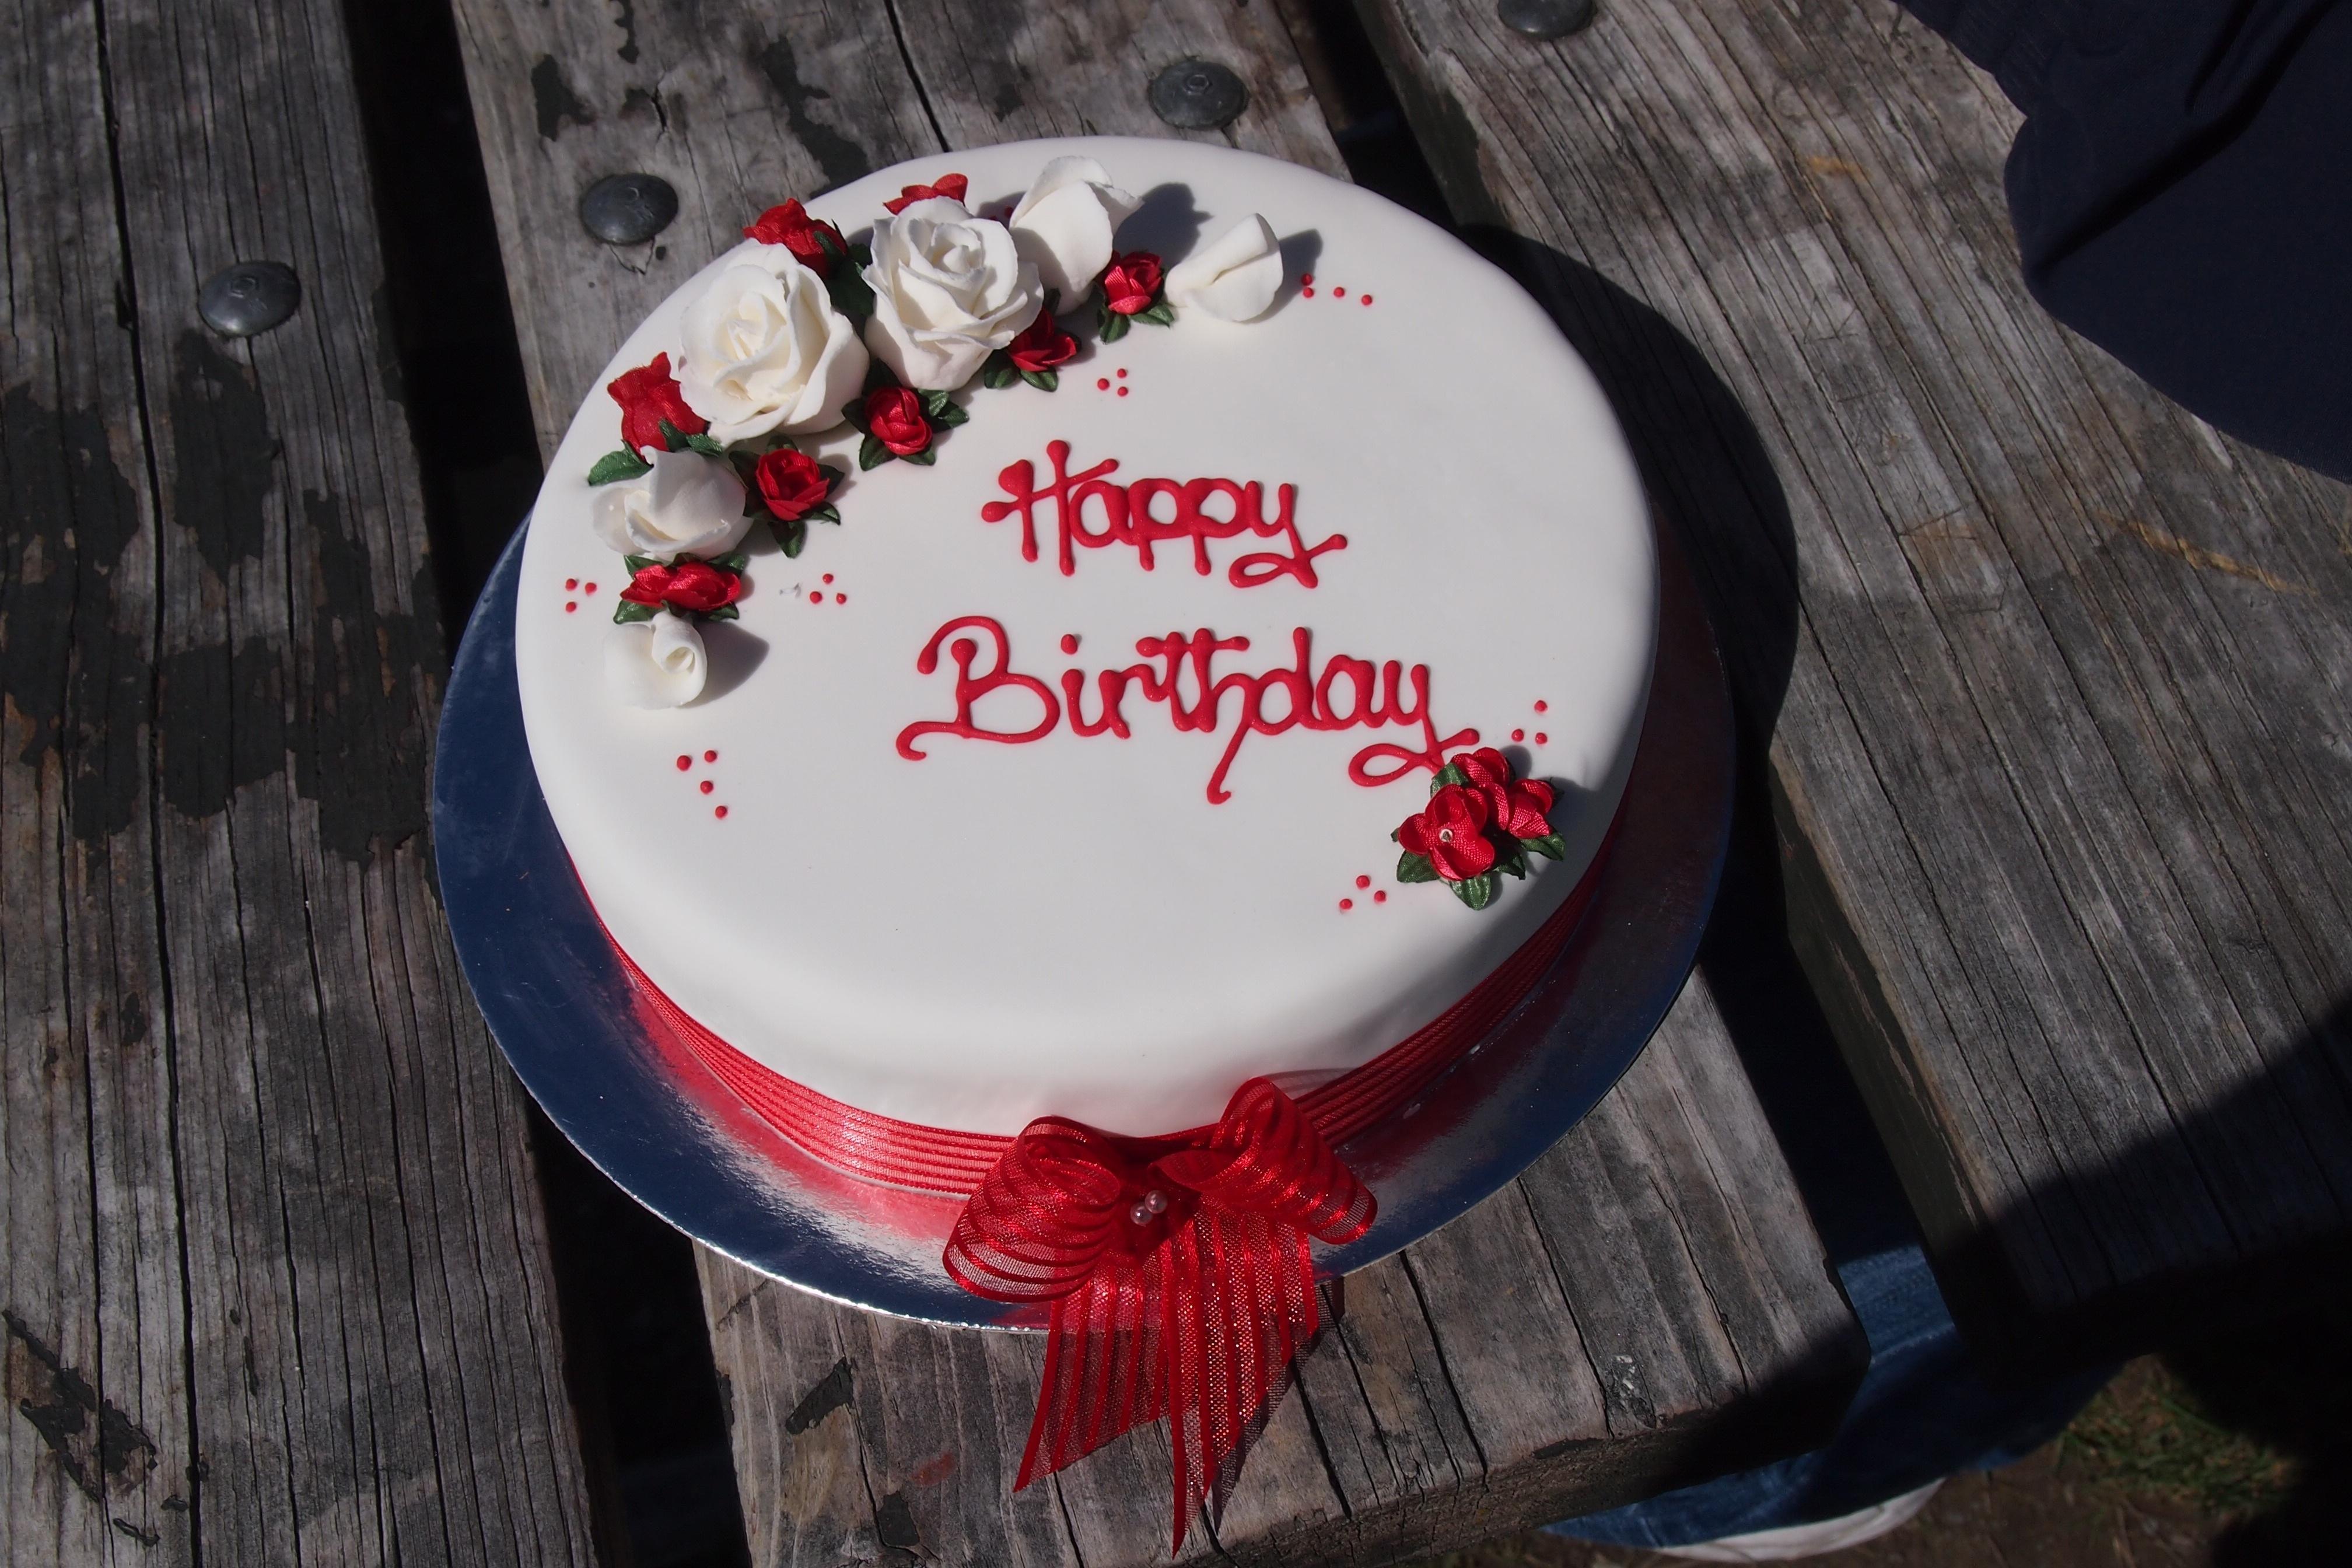 Free Images Food Red Dessert Eat Birthday Cake Sweet Dish